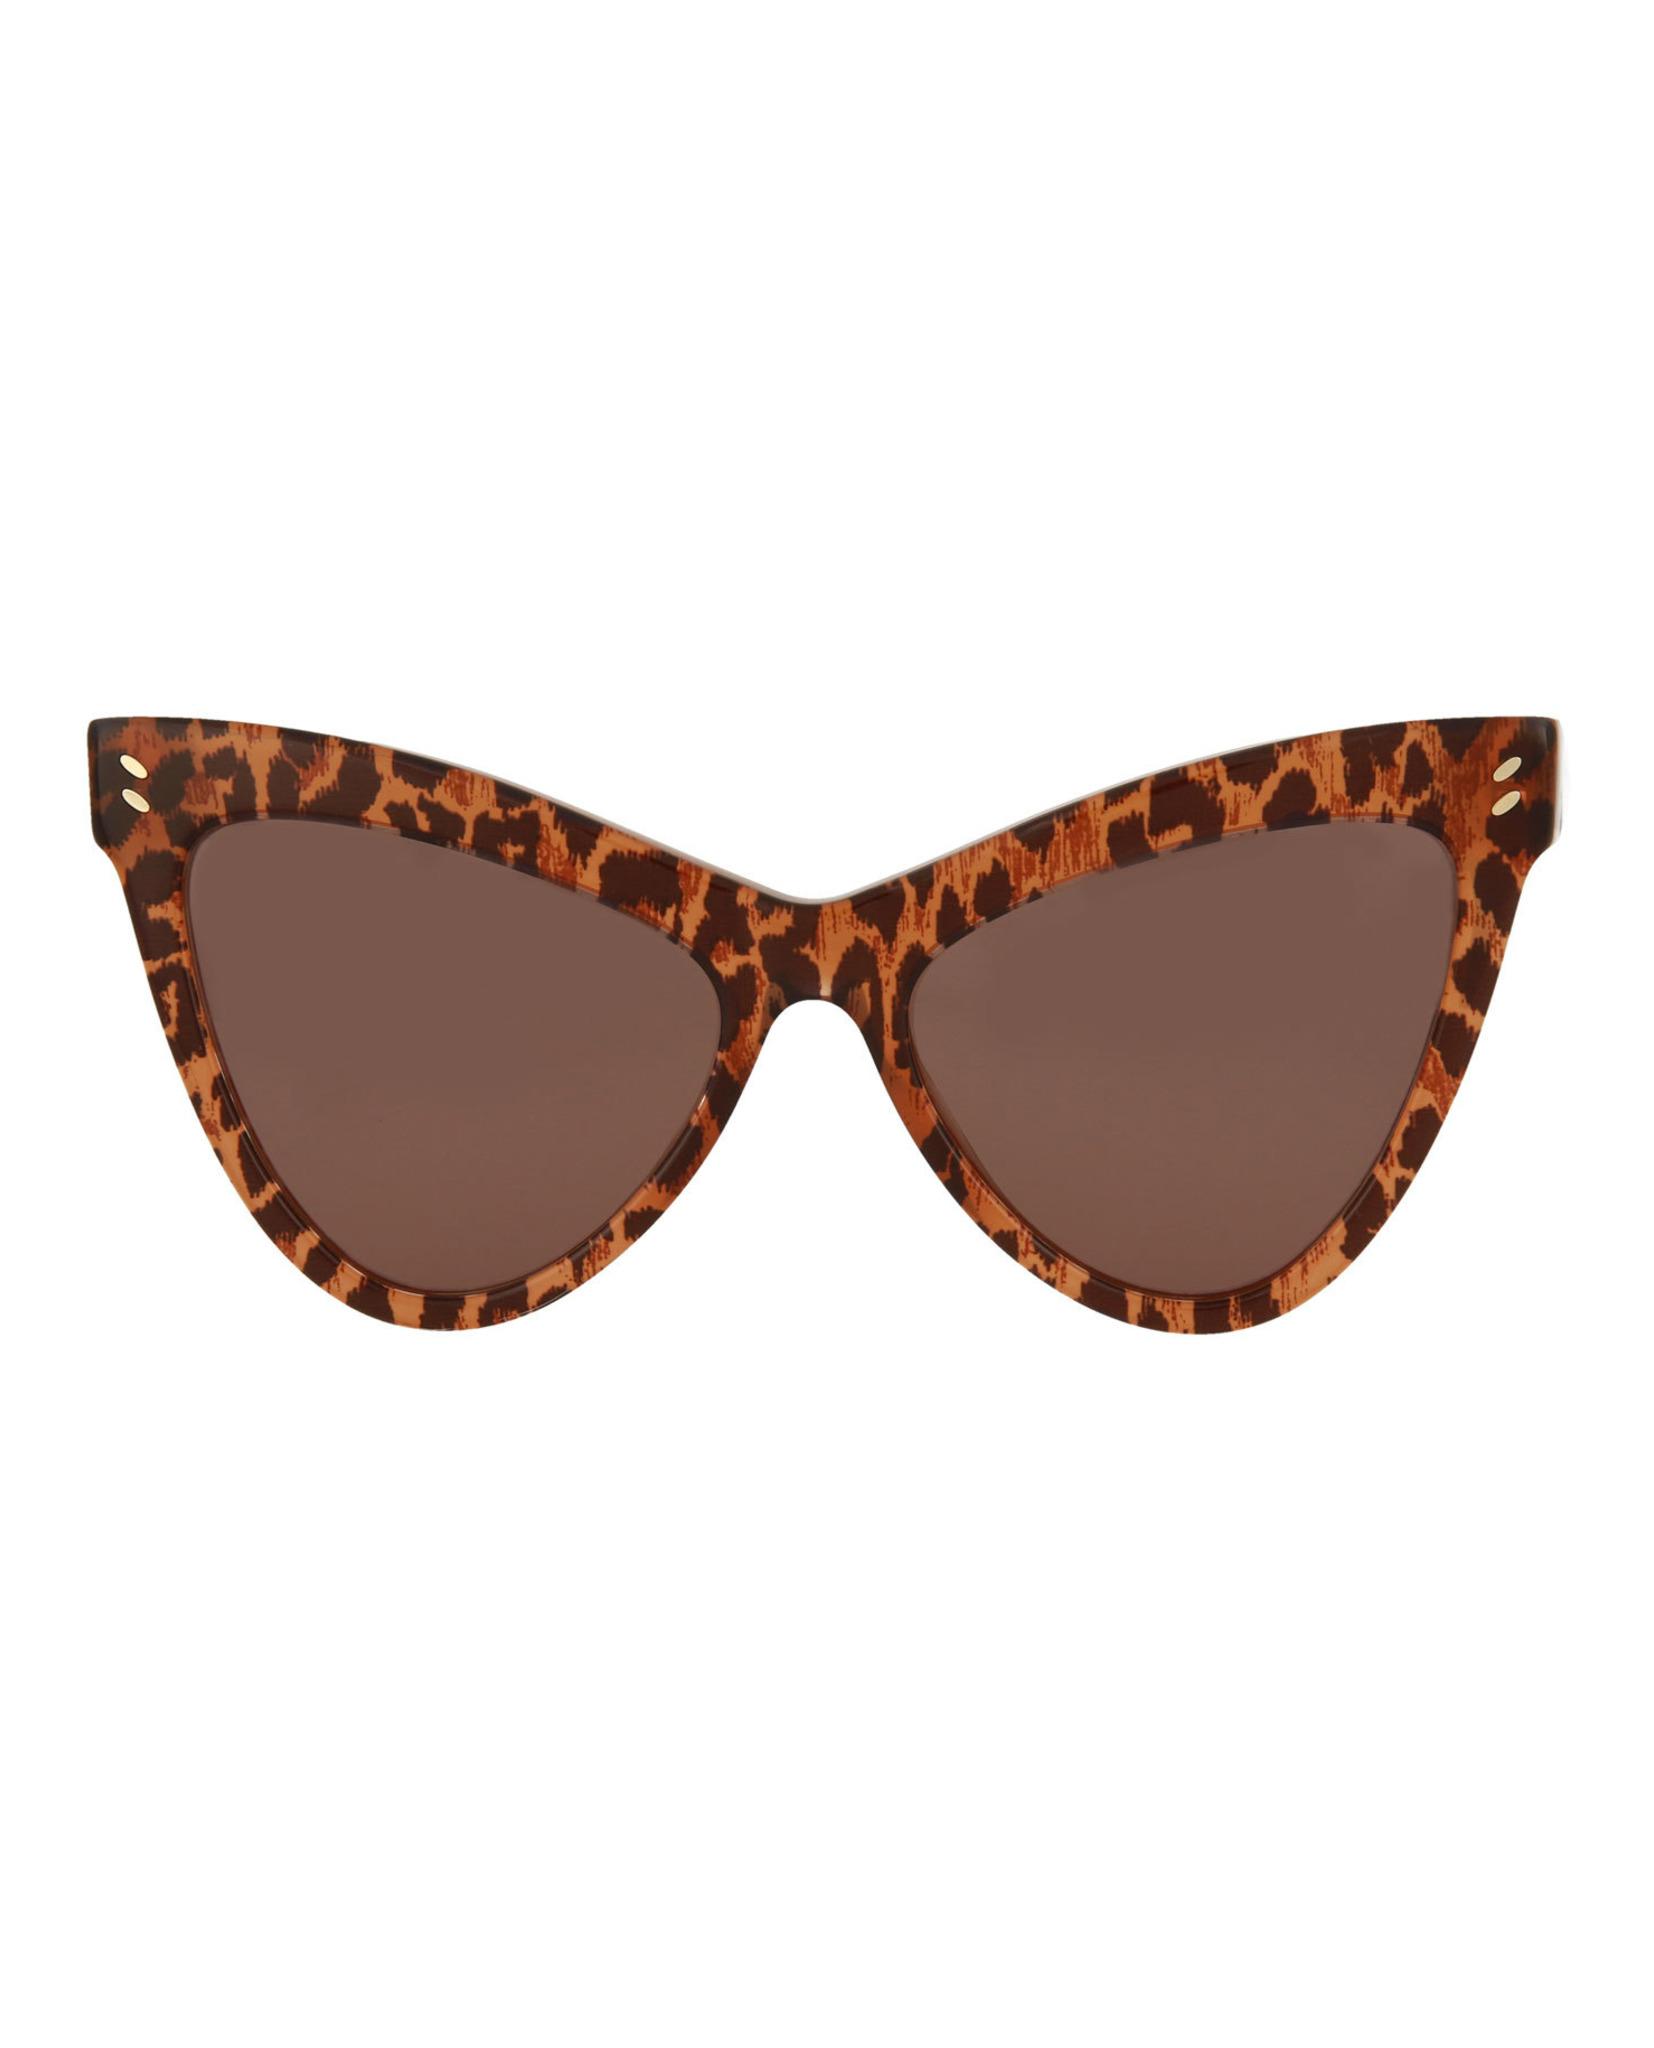 0cbd9563845 Stella McCartney Womens Cat Eye Sunglasses SC0034S-30000585-004 ...